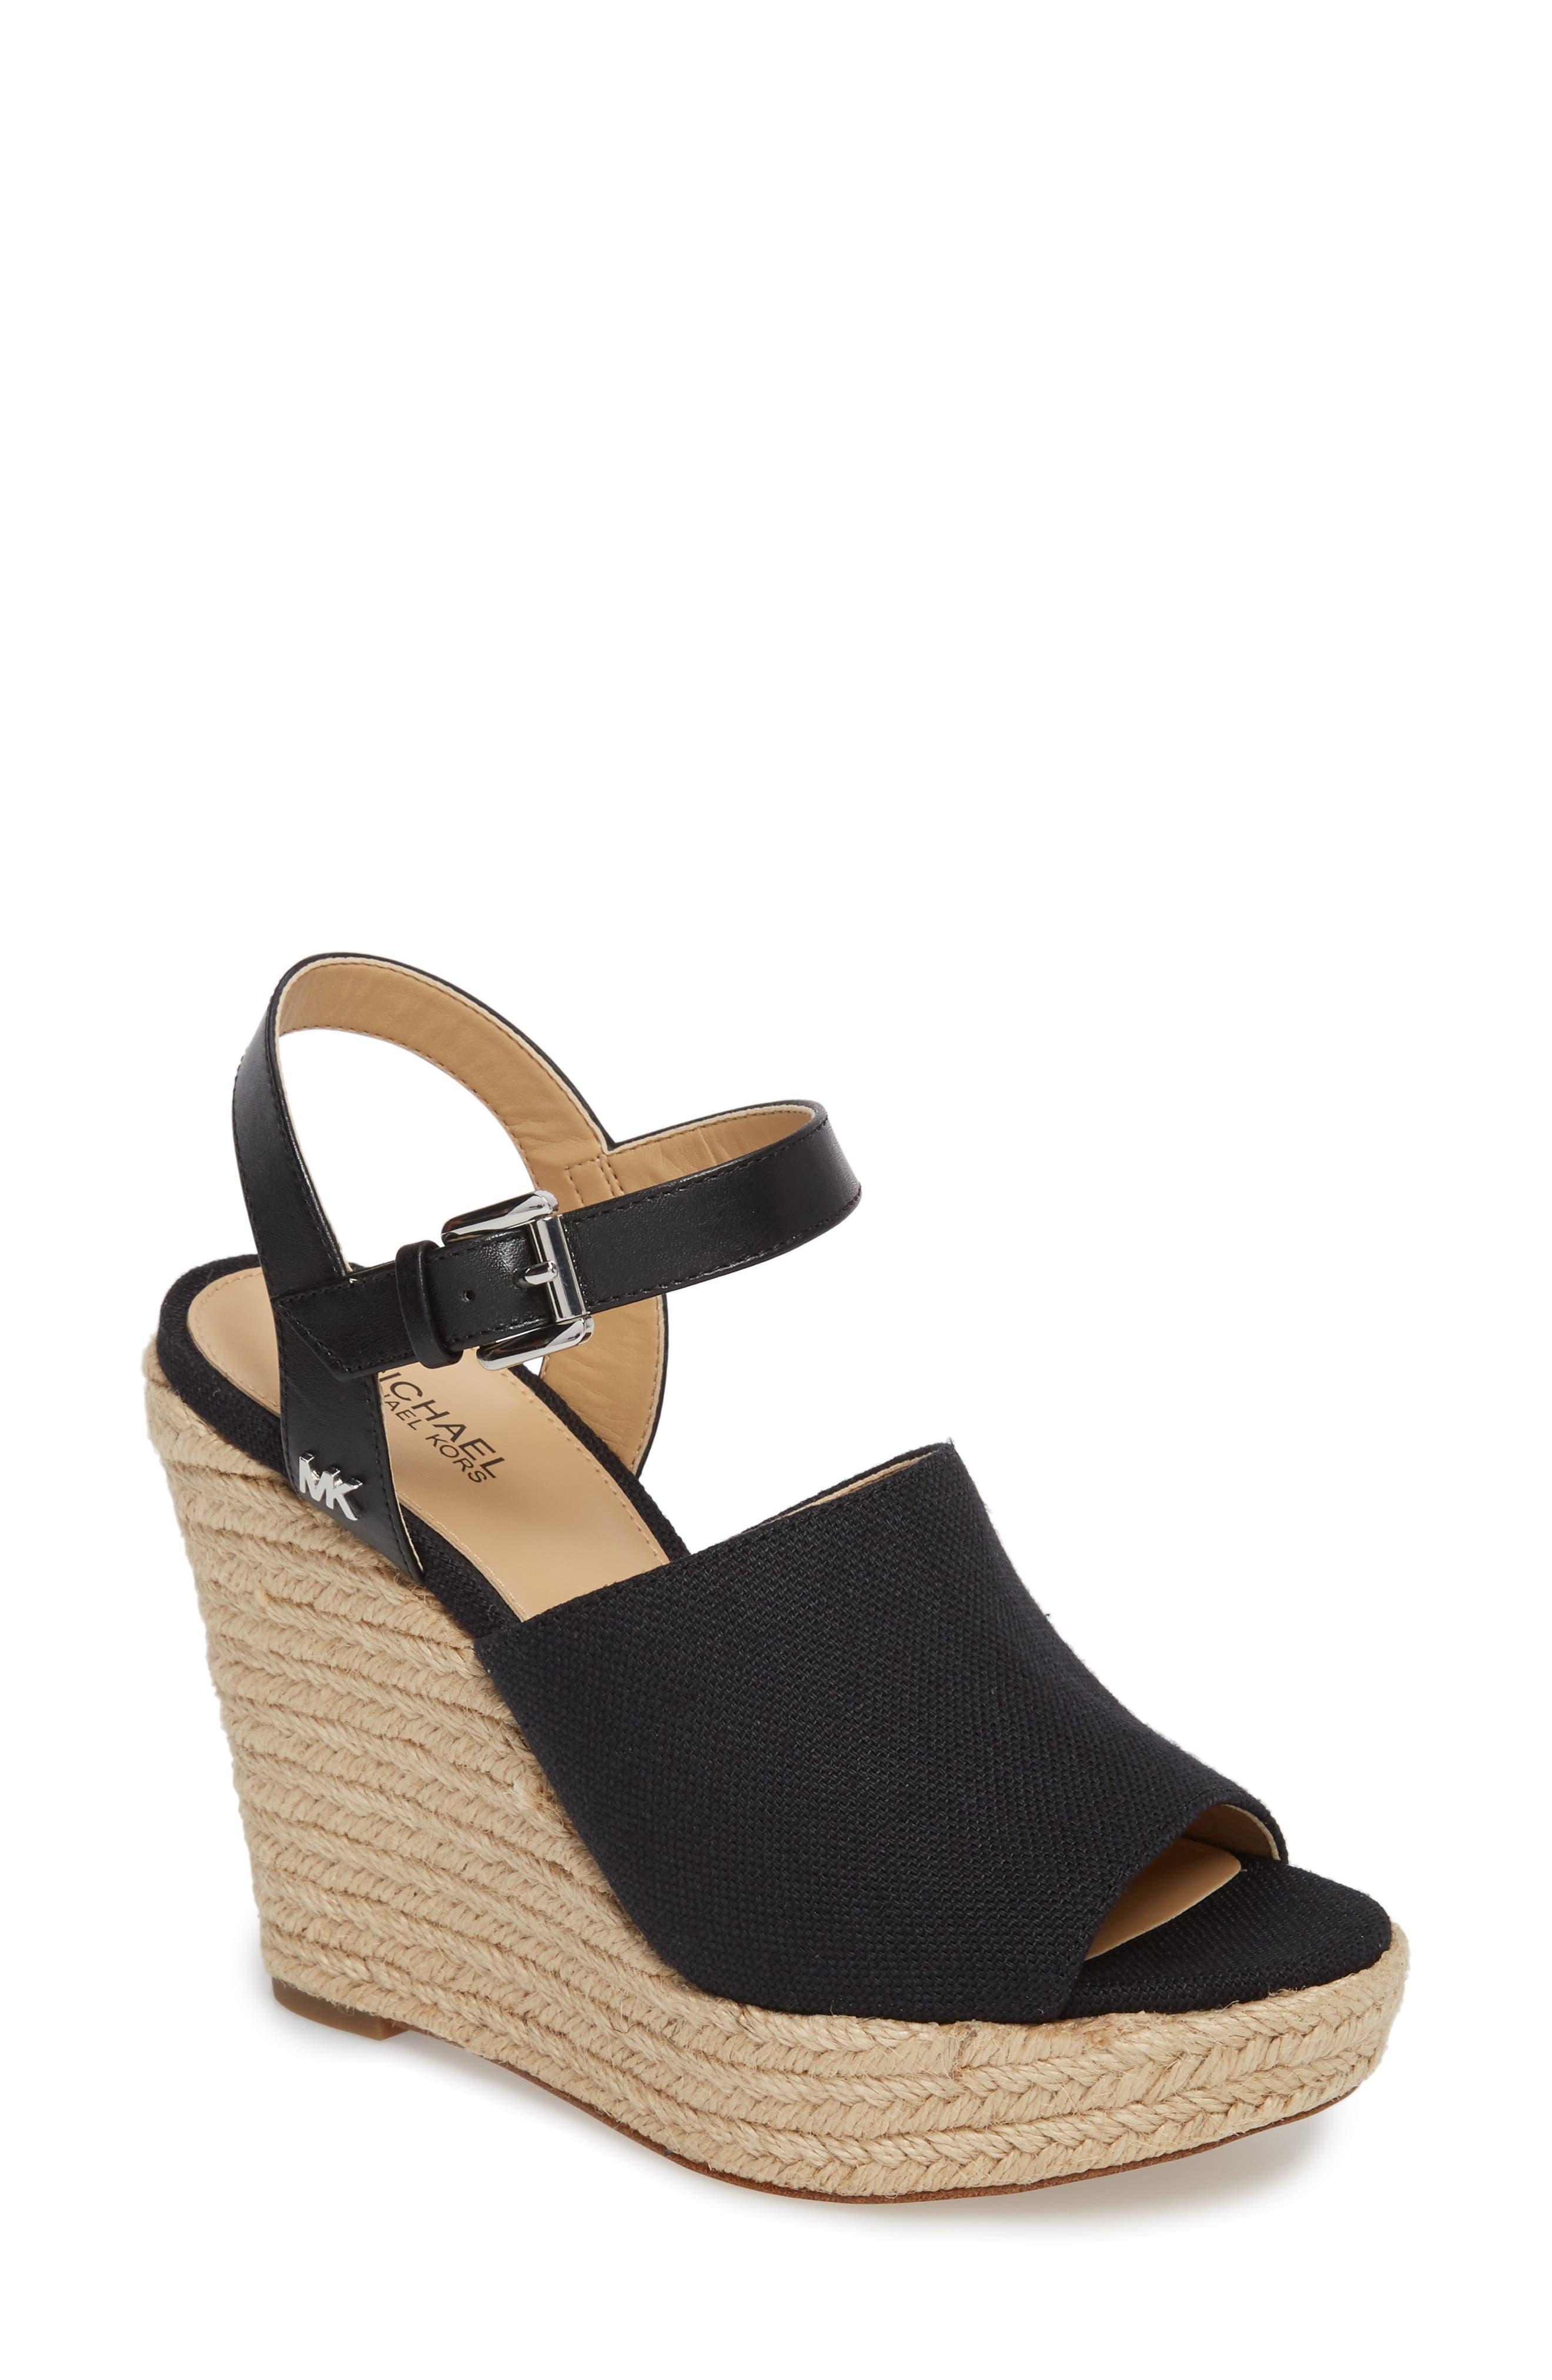 Penelope Espadrille Wedge Sandal,                         Main,                         color, 001